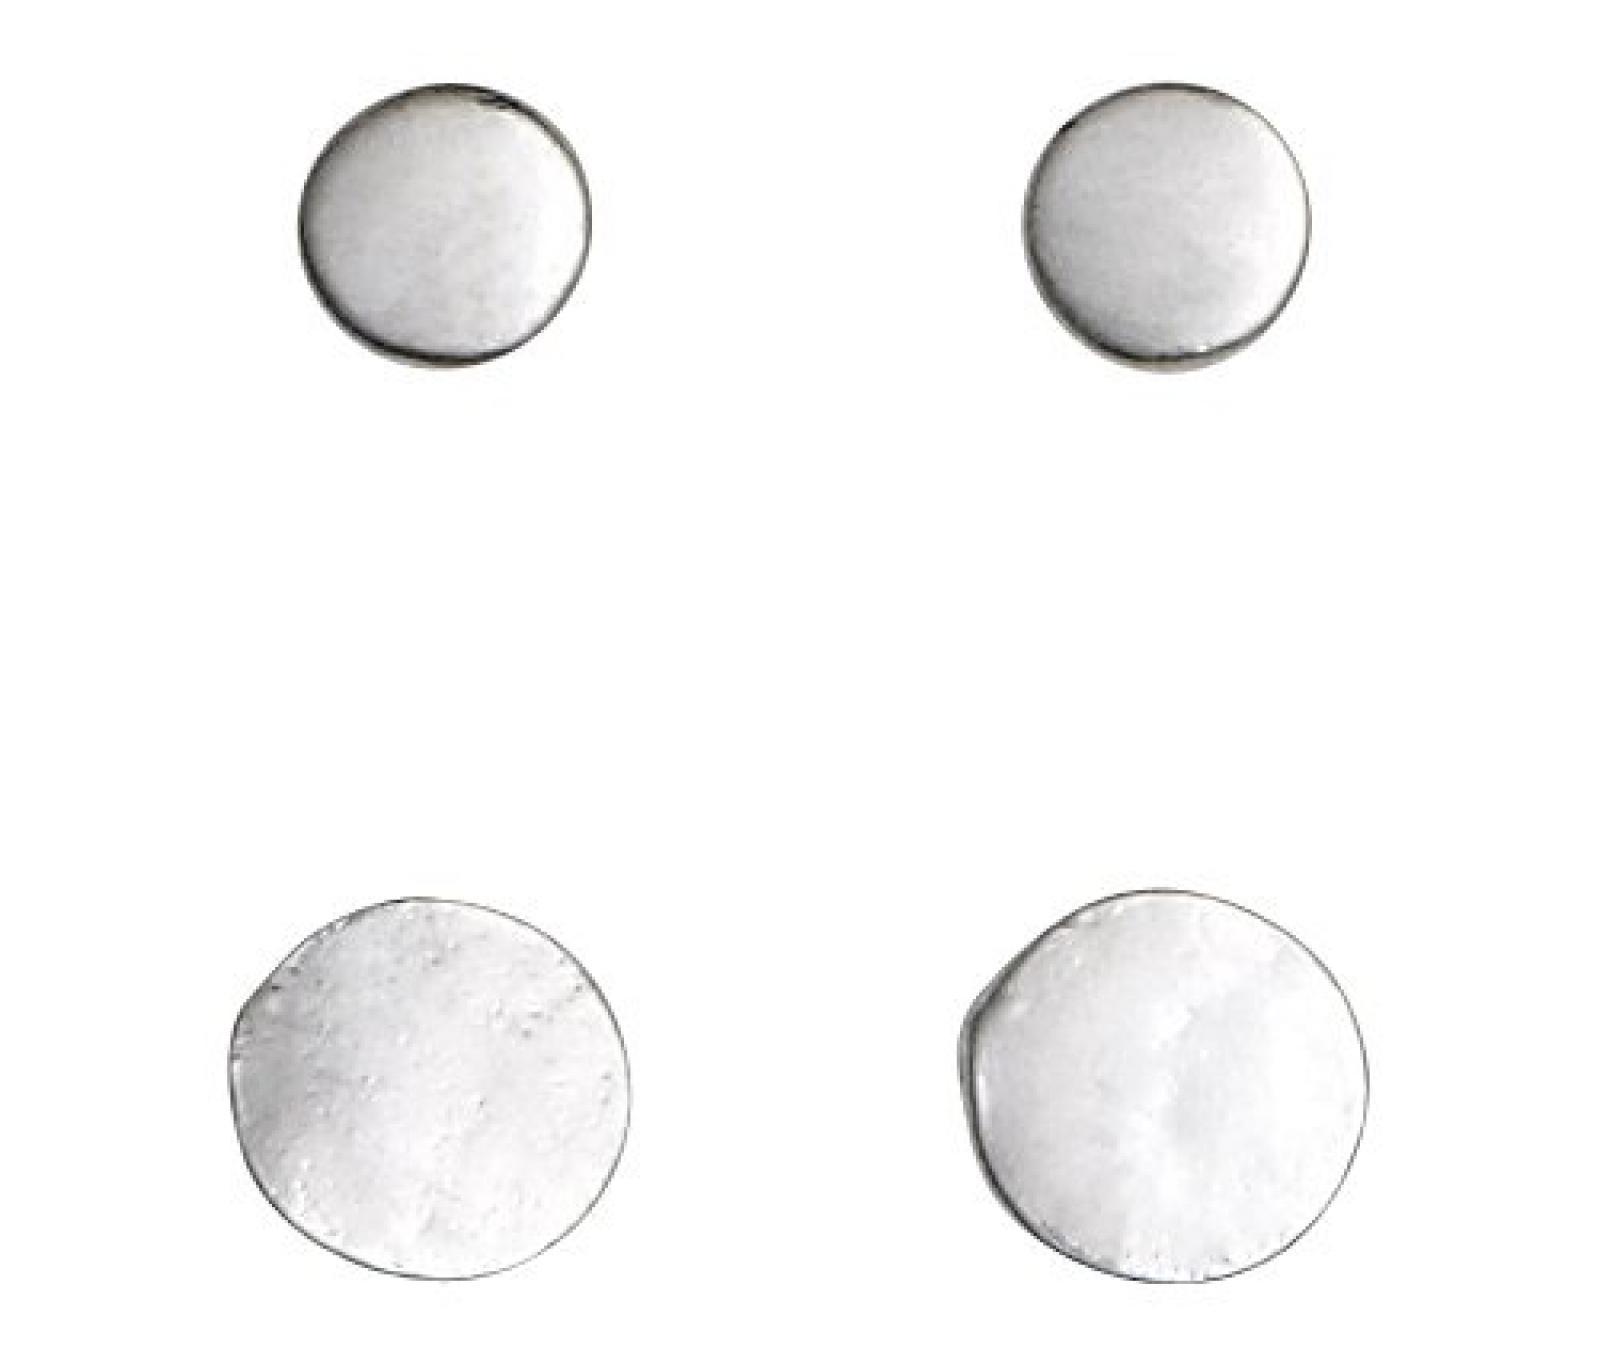 Pilgrim Jewelry Damen-Ohrstecker aus der Serie On one card versilbert 0.4 + 0.5 cm 311316003